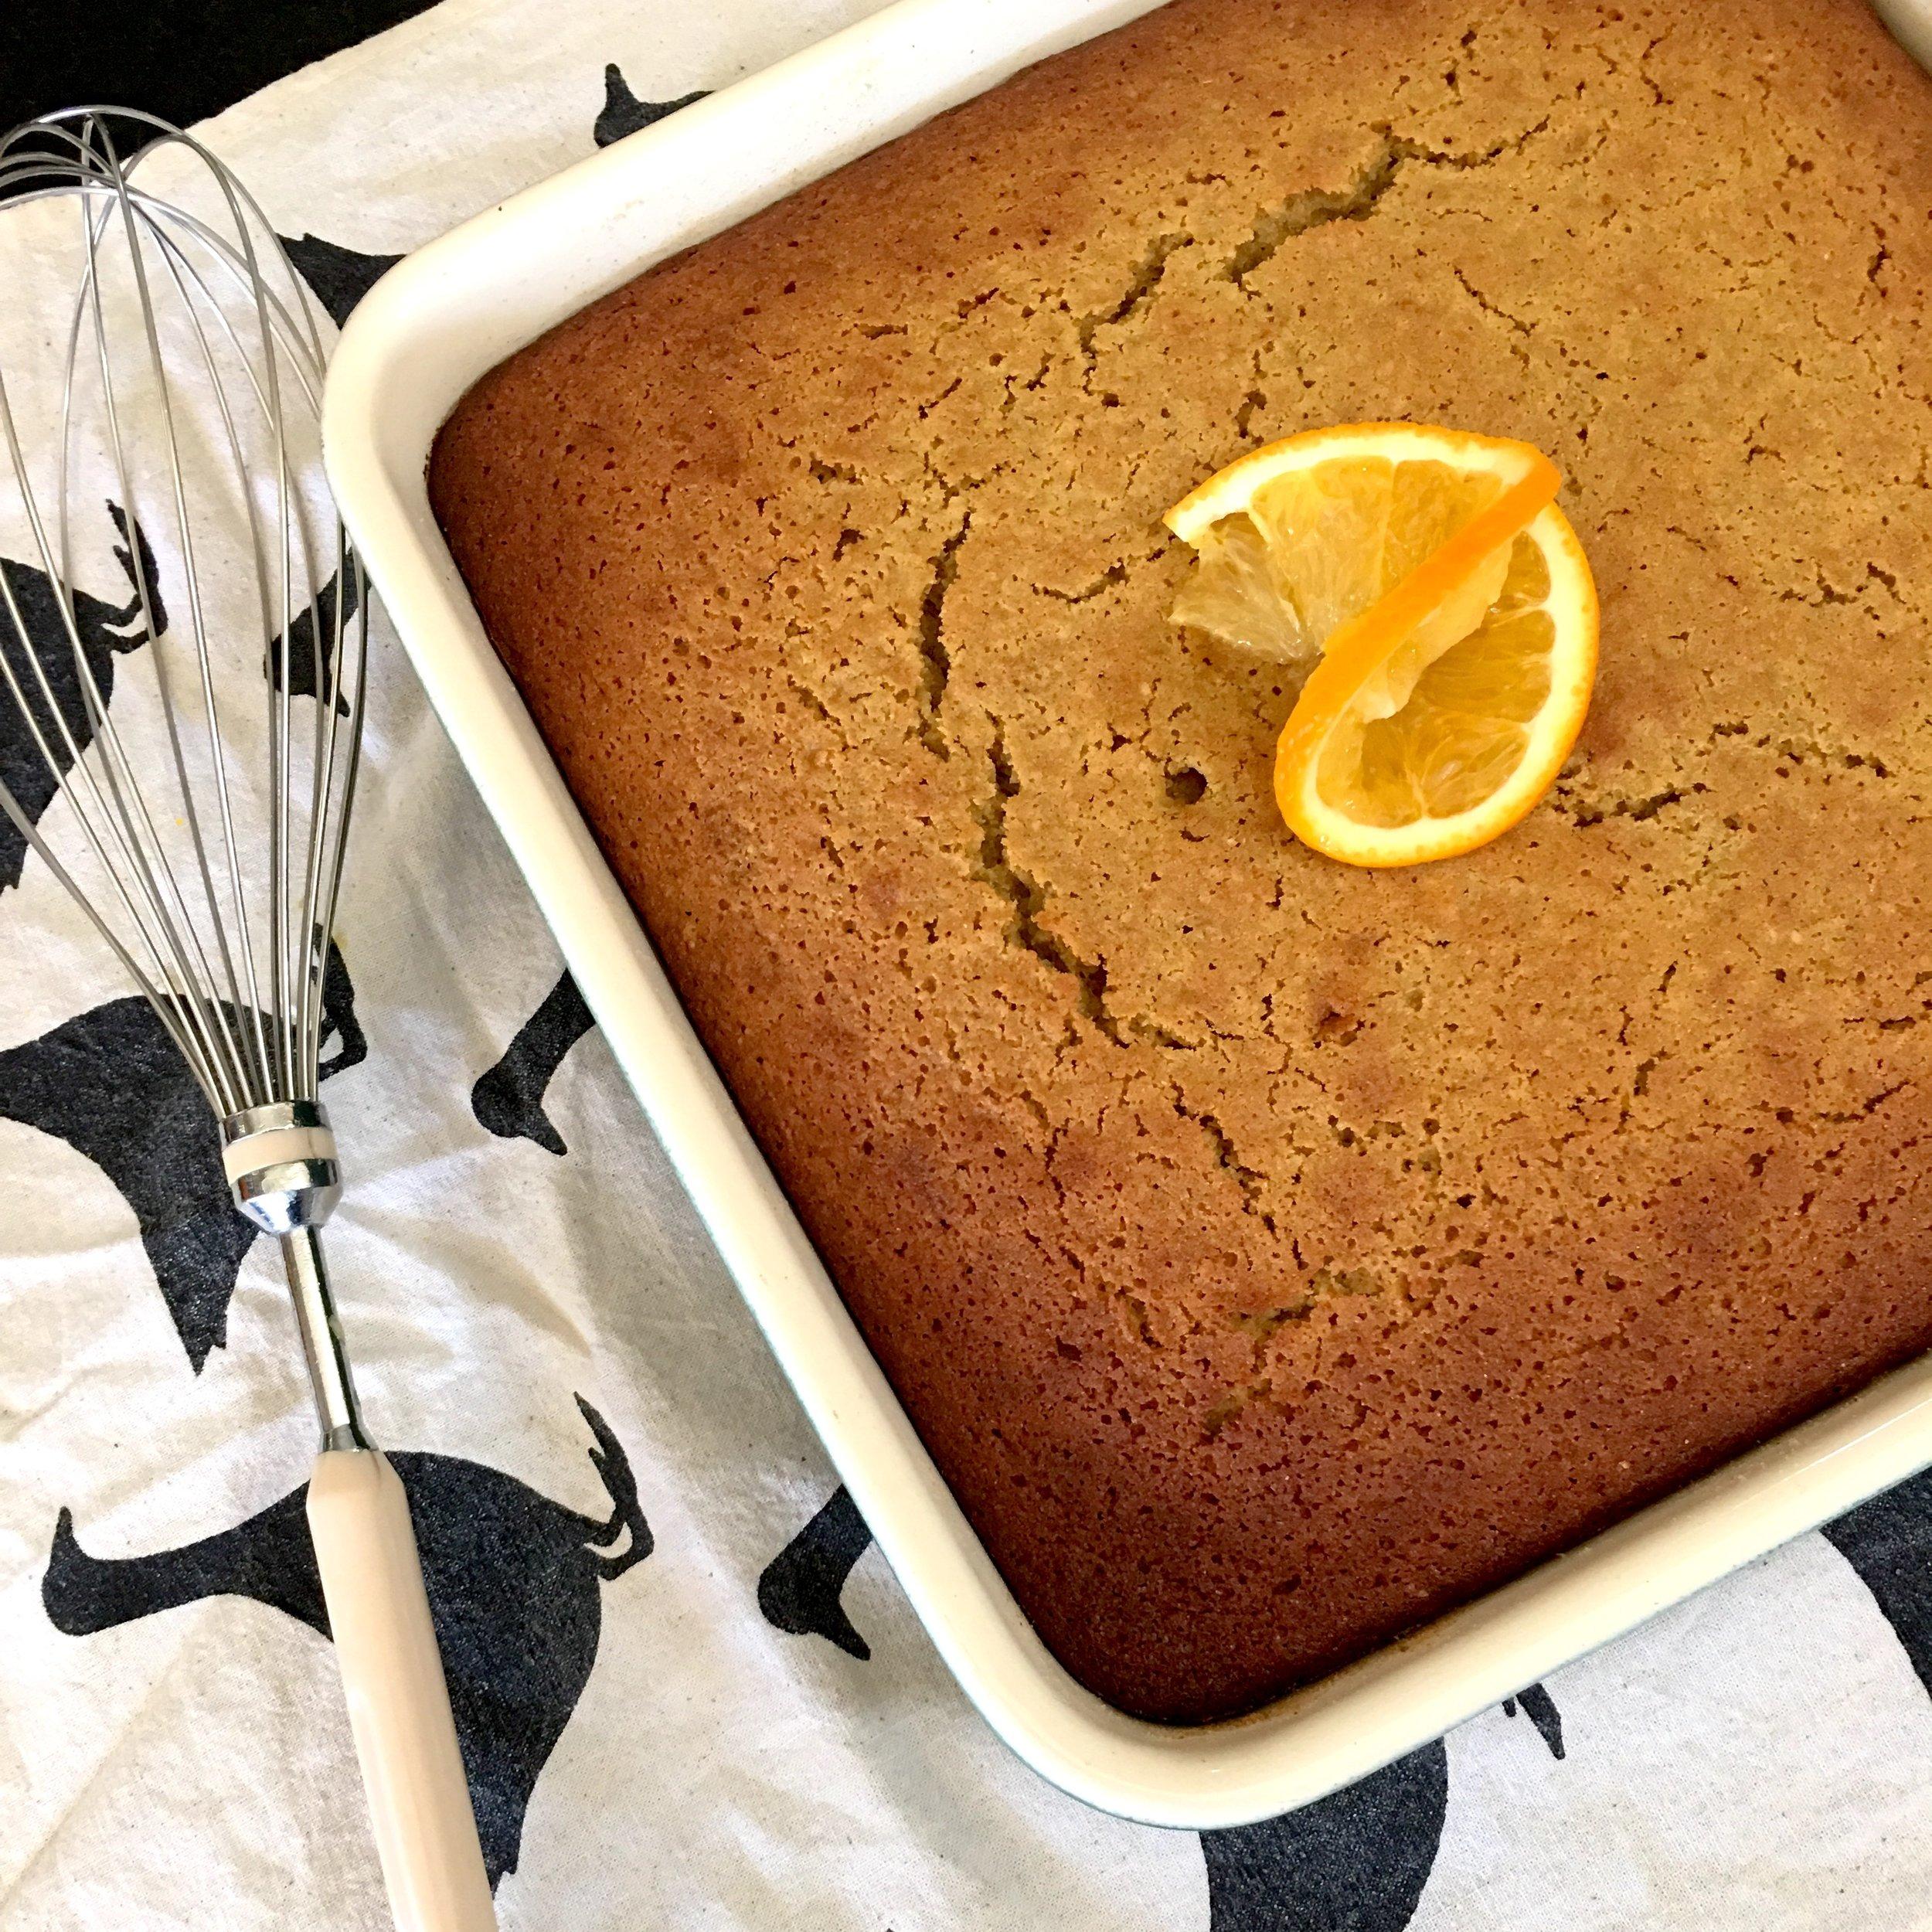 Olea of Monemvasia/Extra Virgin Olive Oil/Recipes/Gluten-free Orange, Olive Oil, Hoeny and Almond cake